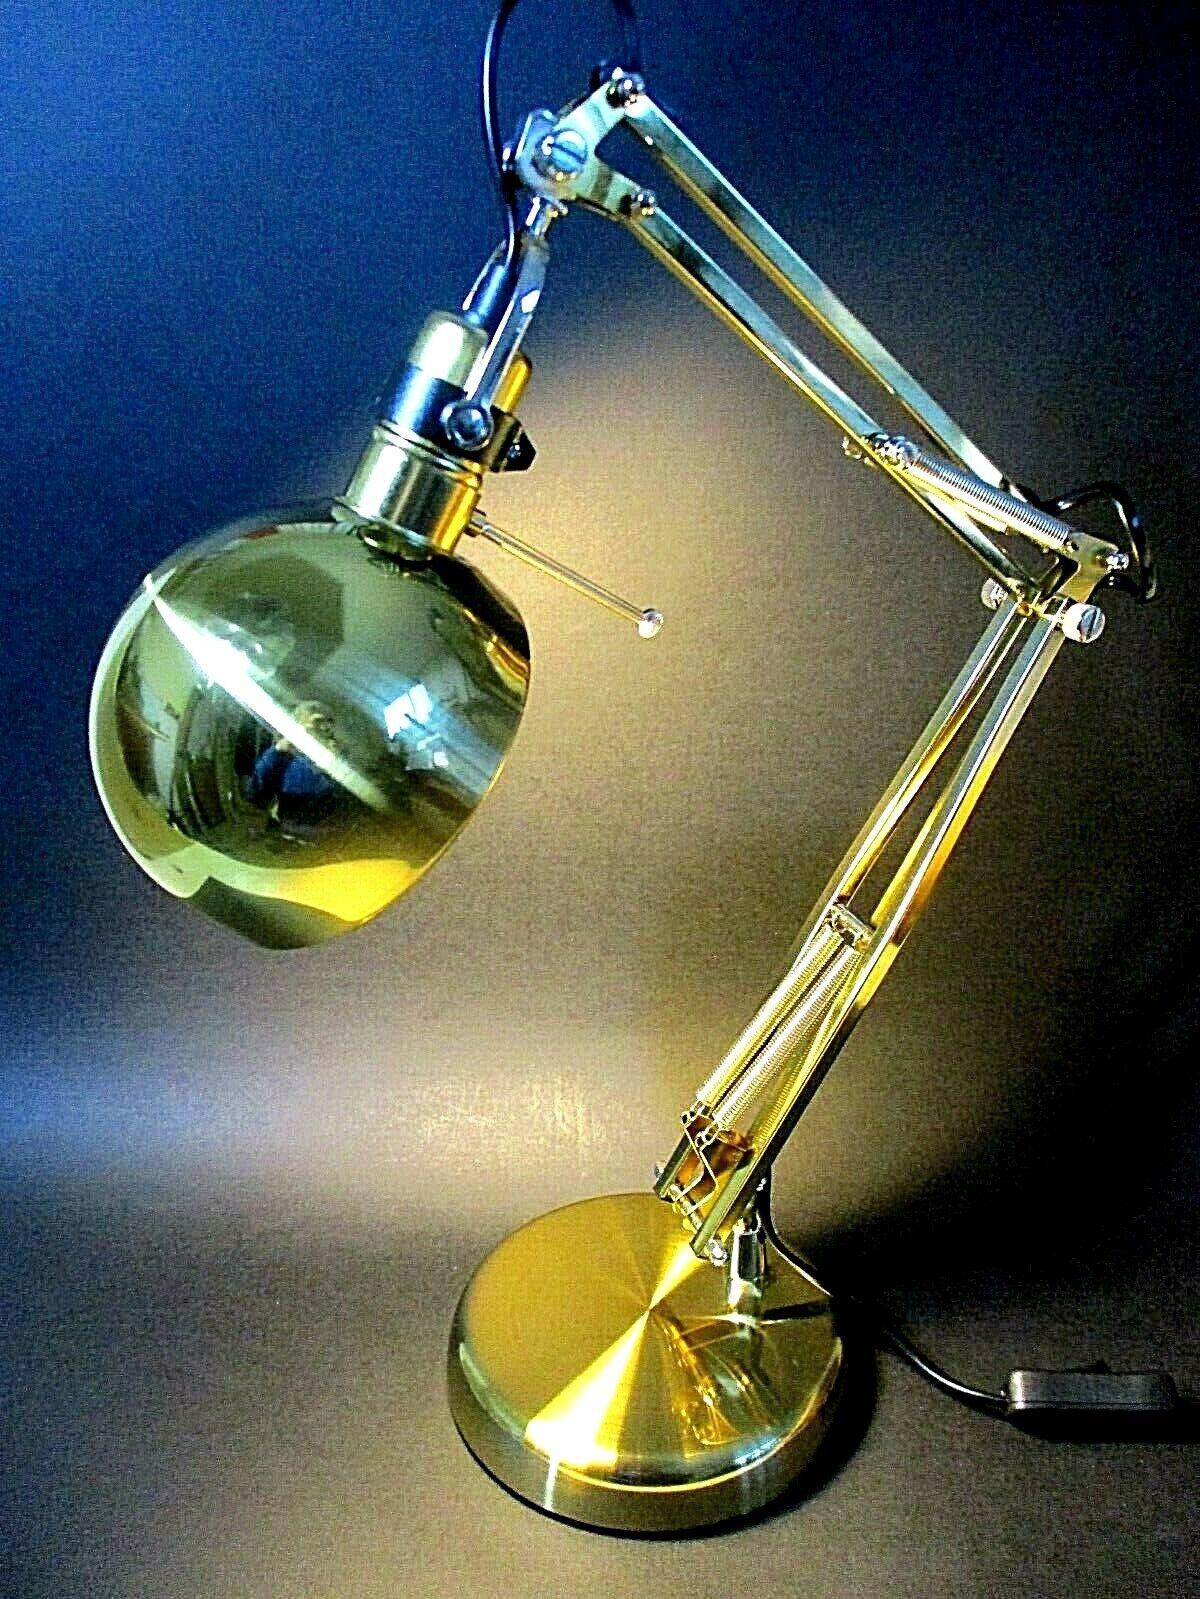 MULTI ANGLE DIRECTION POSEABLE LAMP - BRUSH BRASS FINISH - HEAVY BASE 28  - BNIB